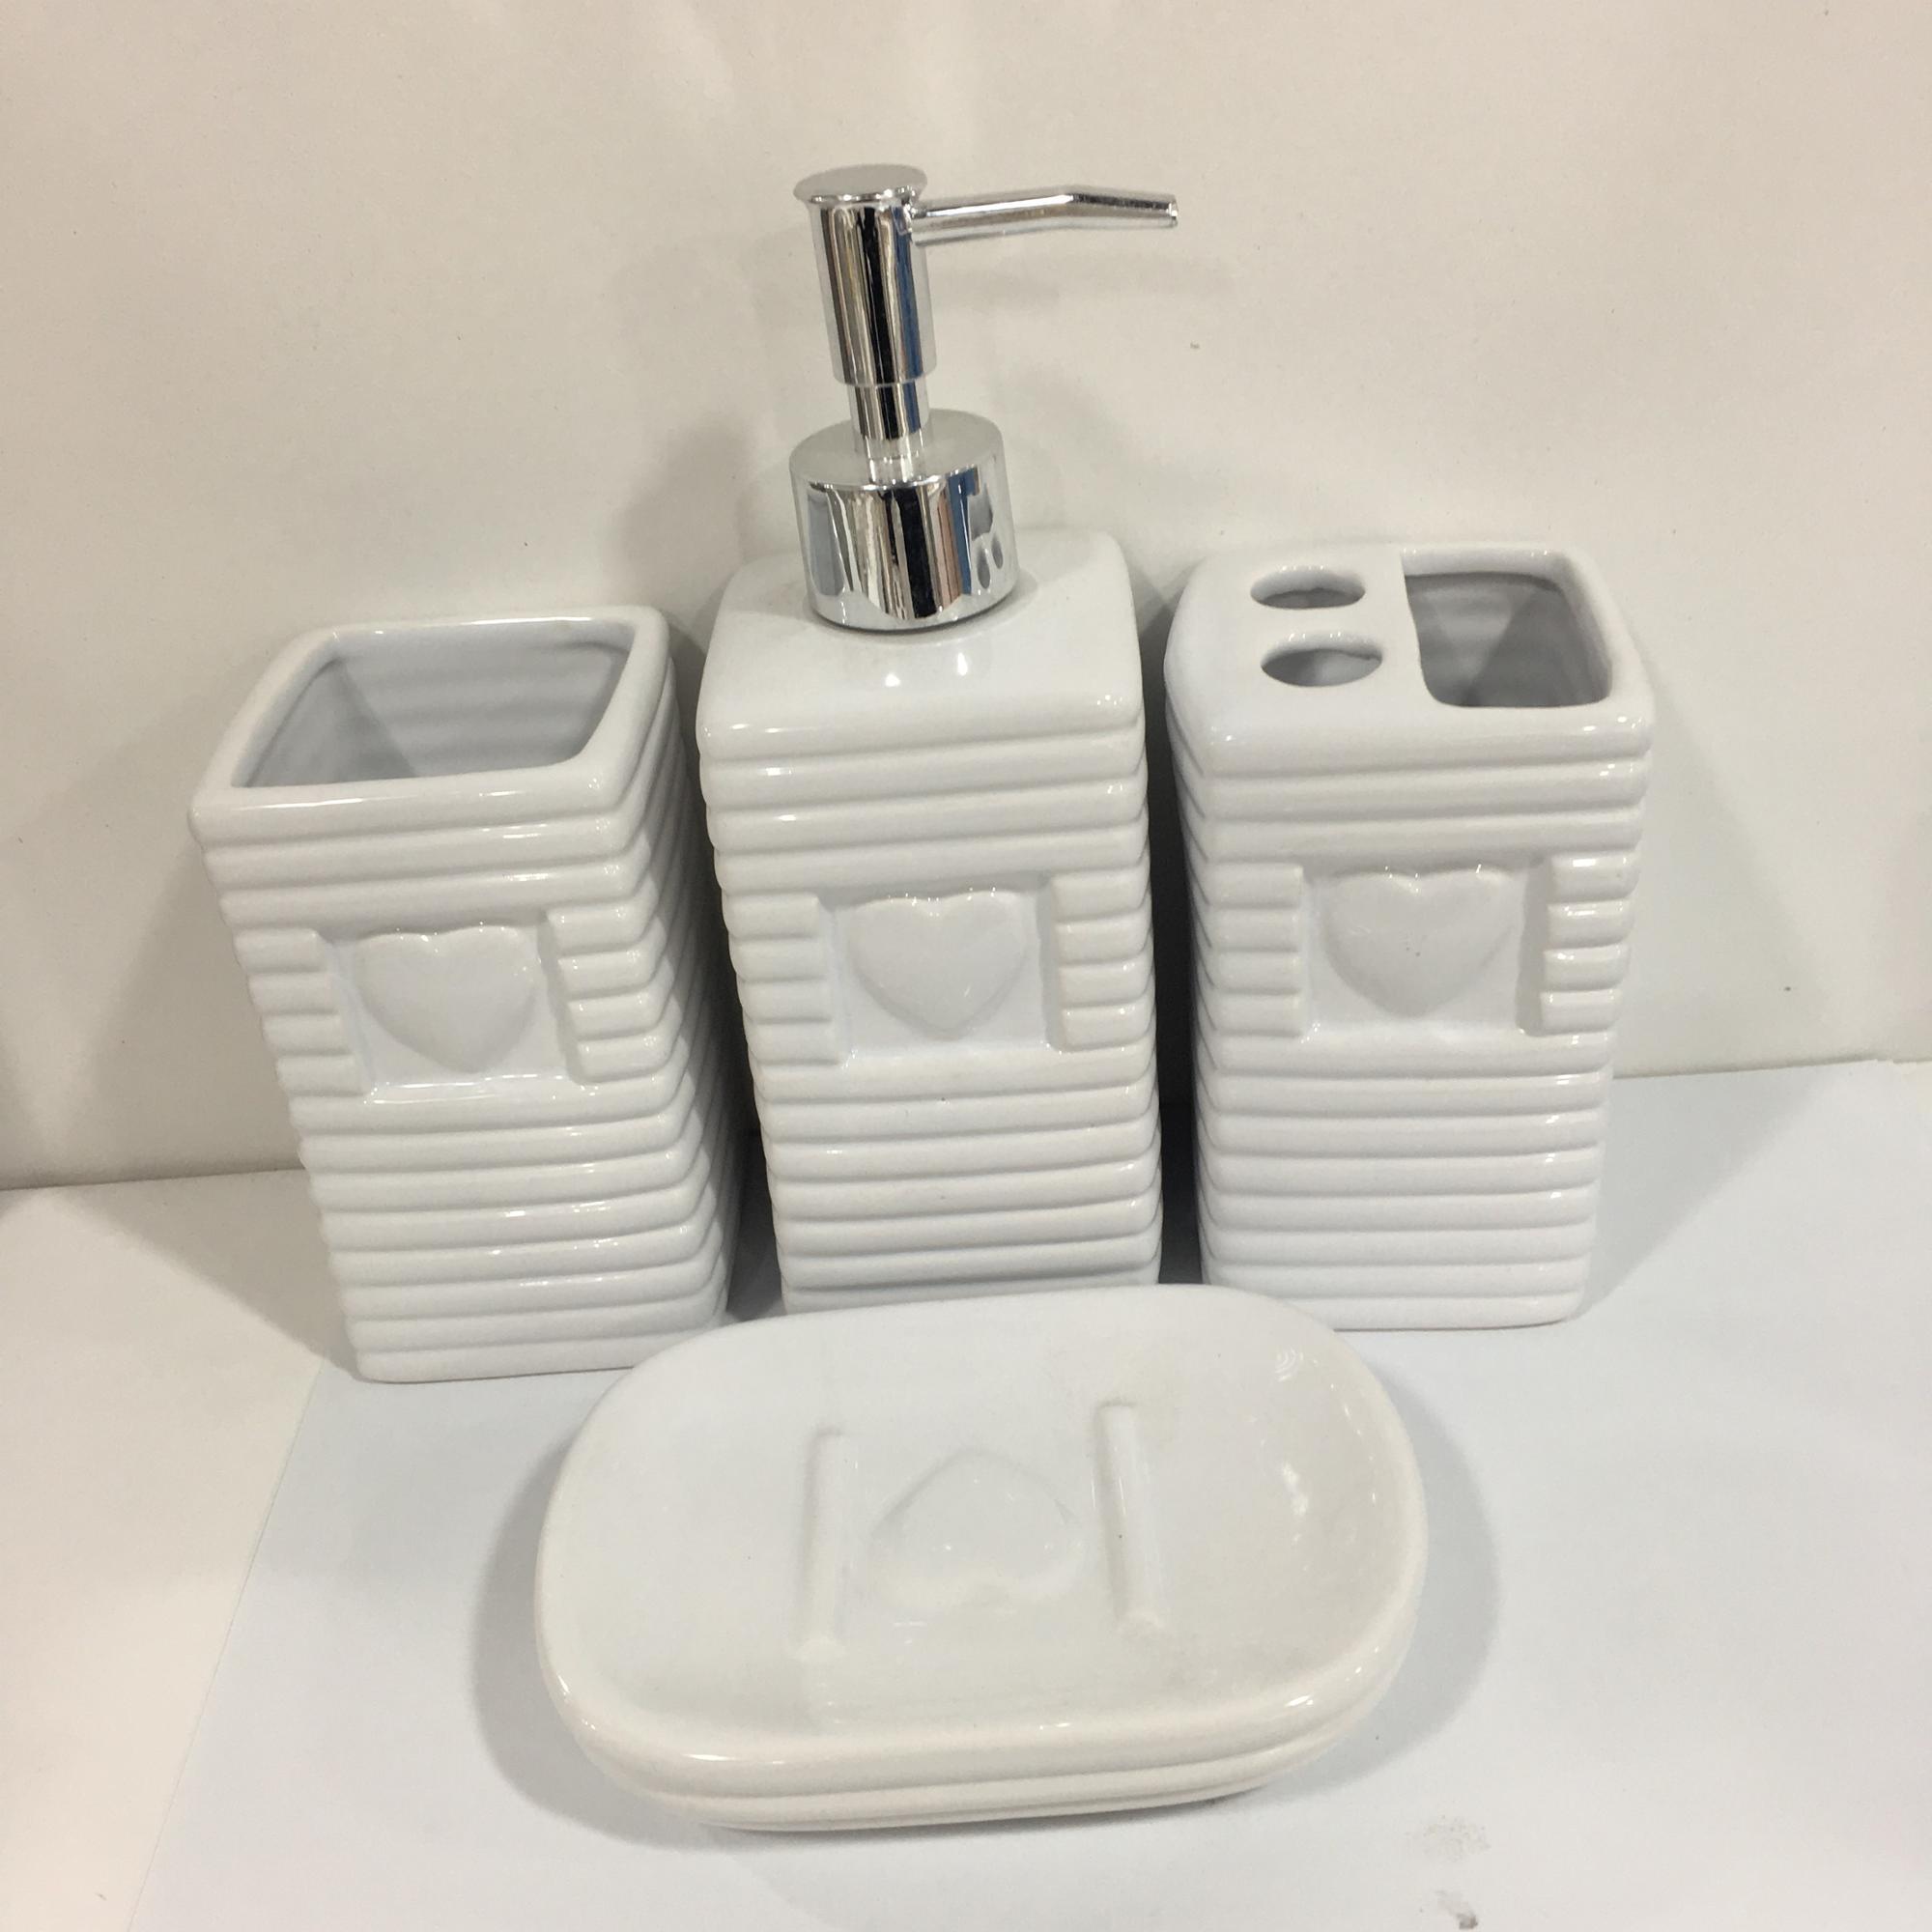 Cheap Price Eco Friendly Porcelain Bathroom Set Ceramic